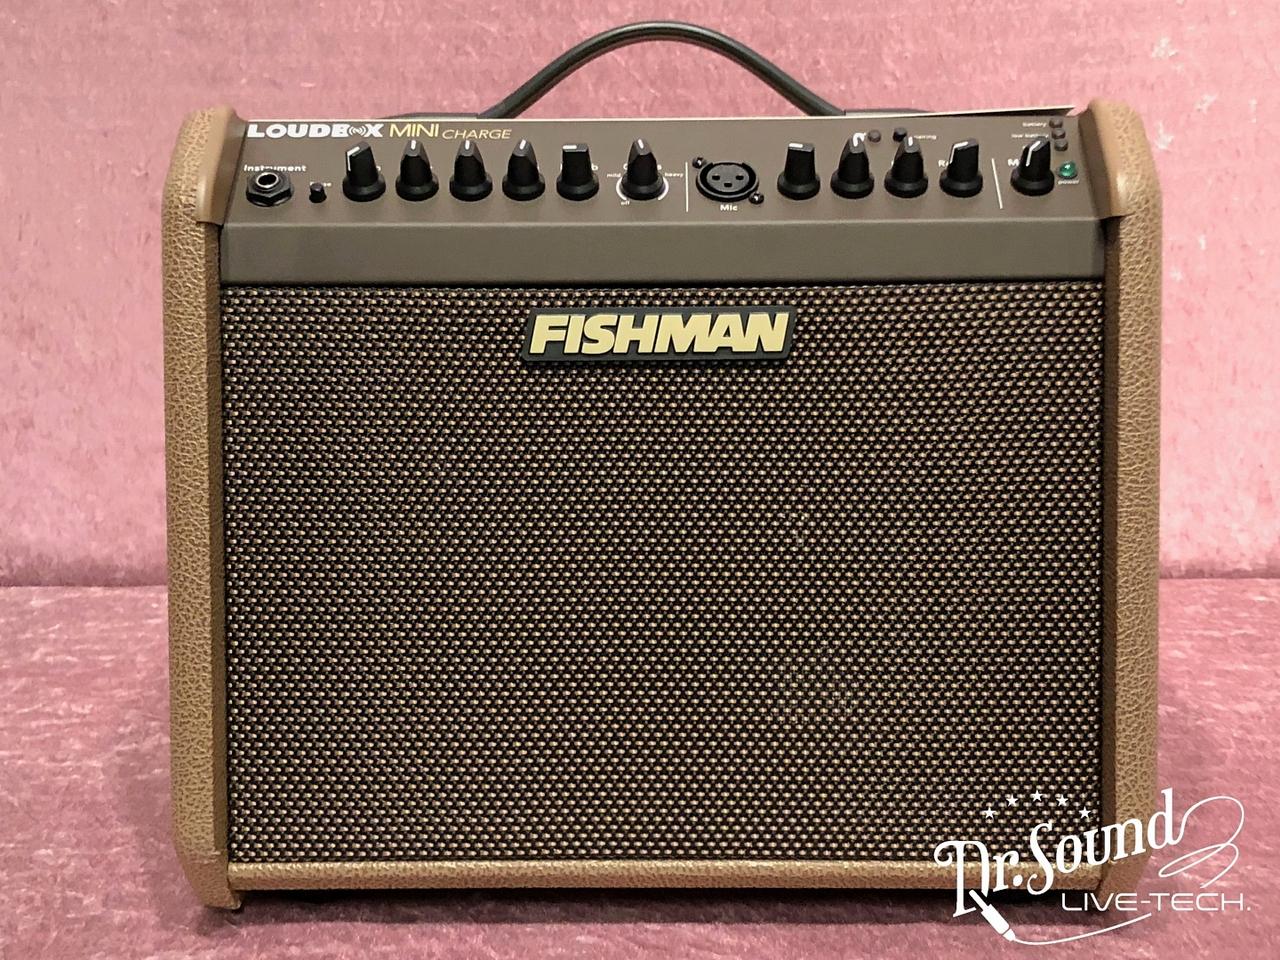 FISHMAN FISHMAN Loudbox Mini Charge [PRO-LBC-500] 《アコースティック用アンプ》【新品】【送料無料】【Dr.Sound在庫】